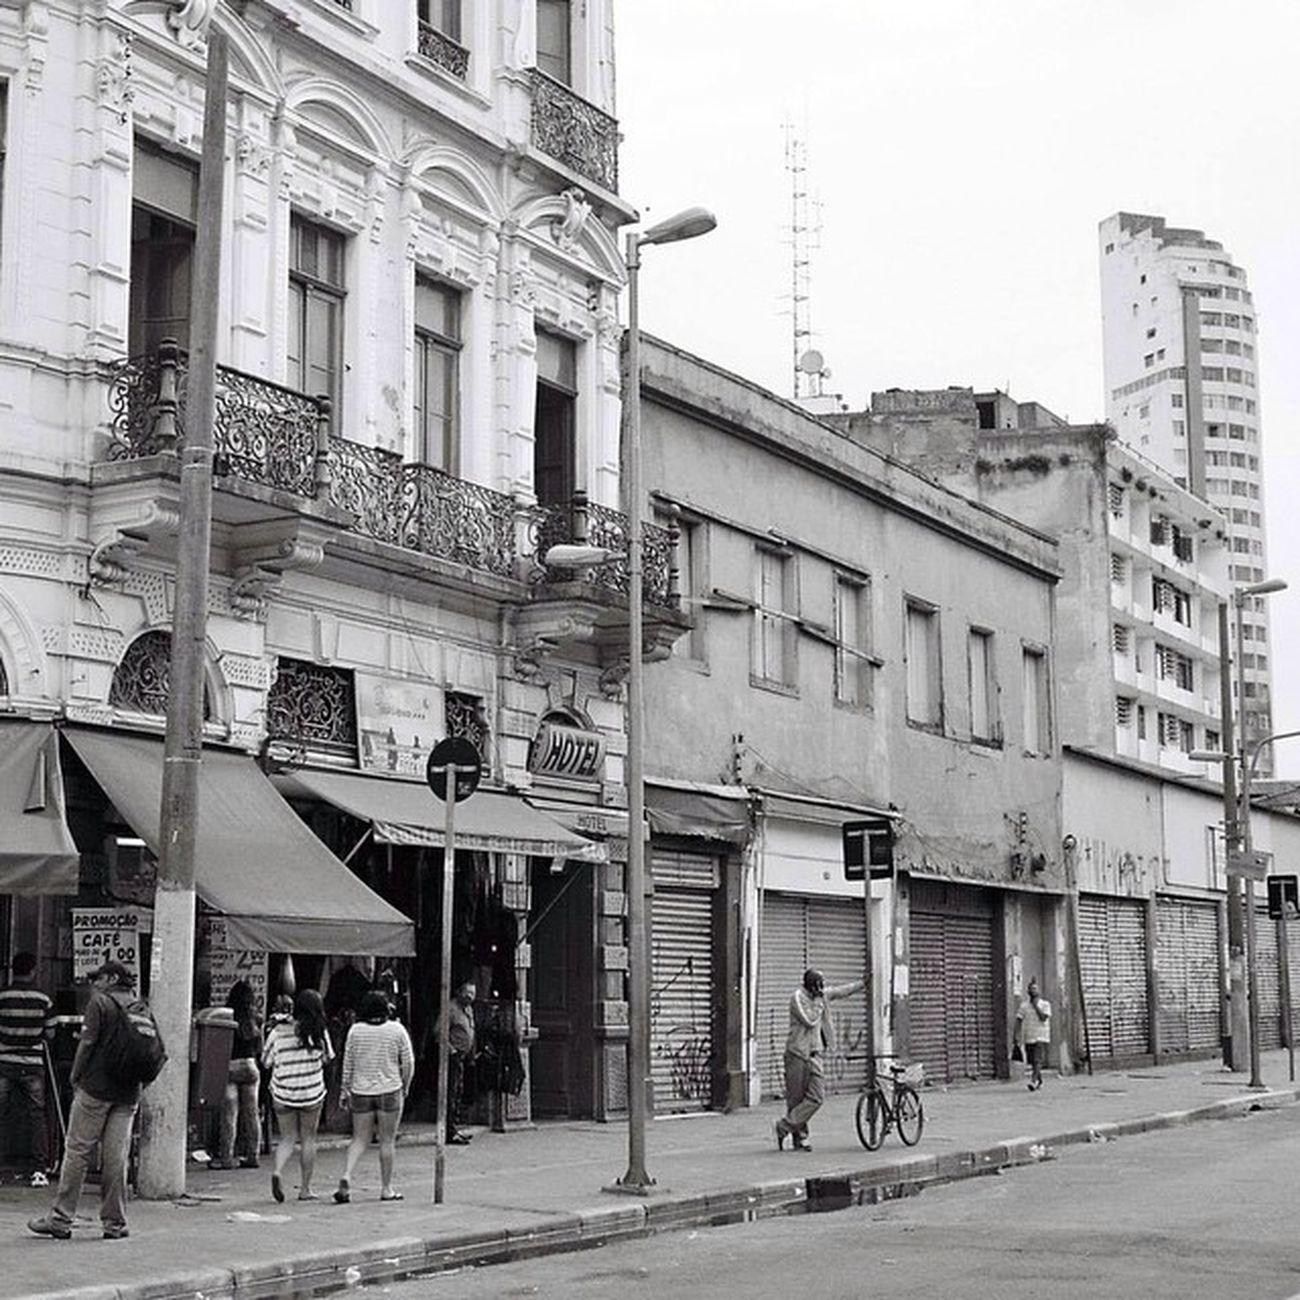 Brazil Brasil Contax Contaxt3 T3 Cymera Cymeraapp People City Blackandwhite Vscocam VSCO Saopaulo